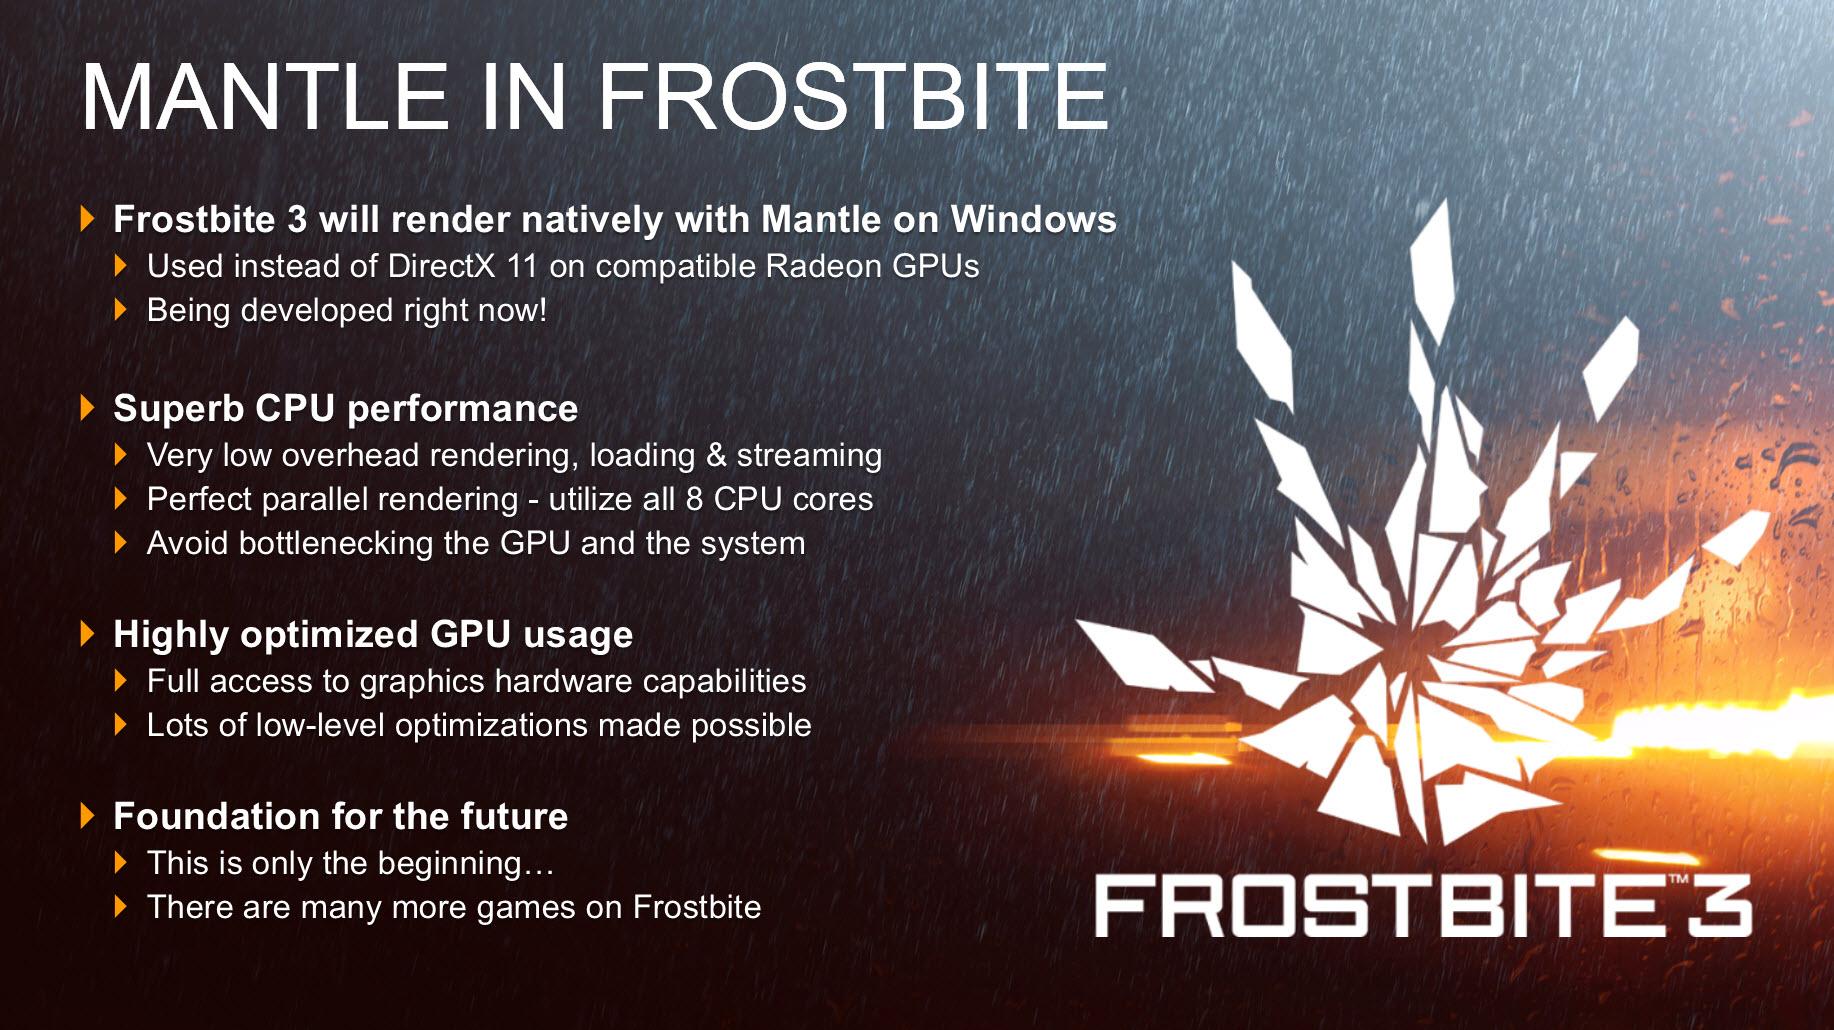 frostbite-3-amd-mantle-api